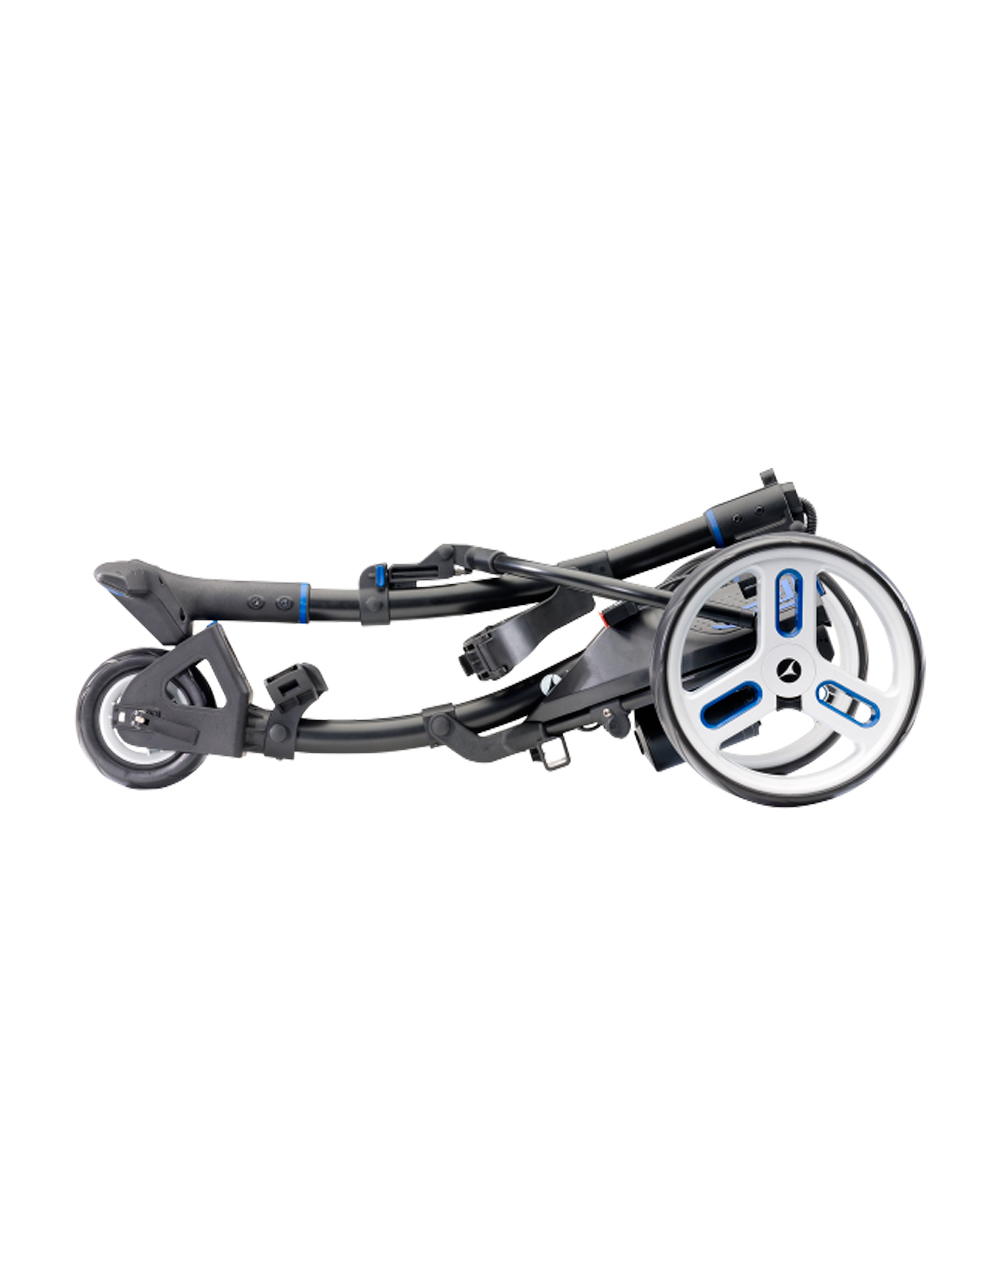 Motocaddy Lithium S3 Digital Second Hand Trolley Top Caddy